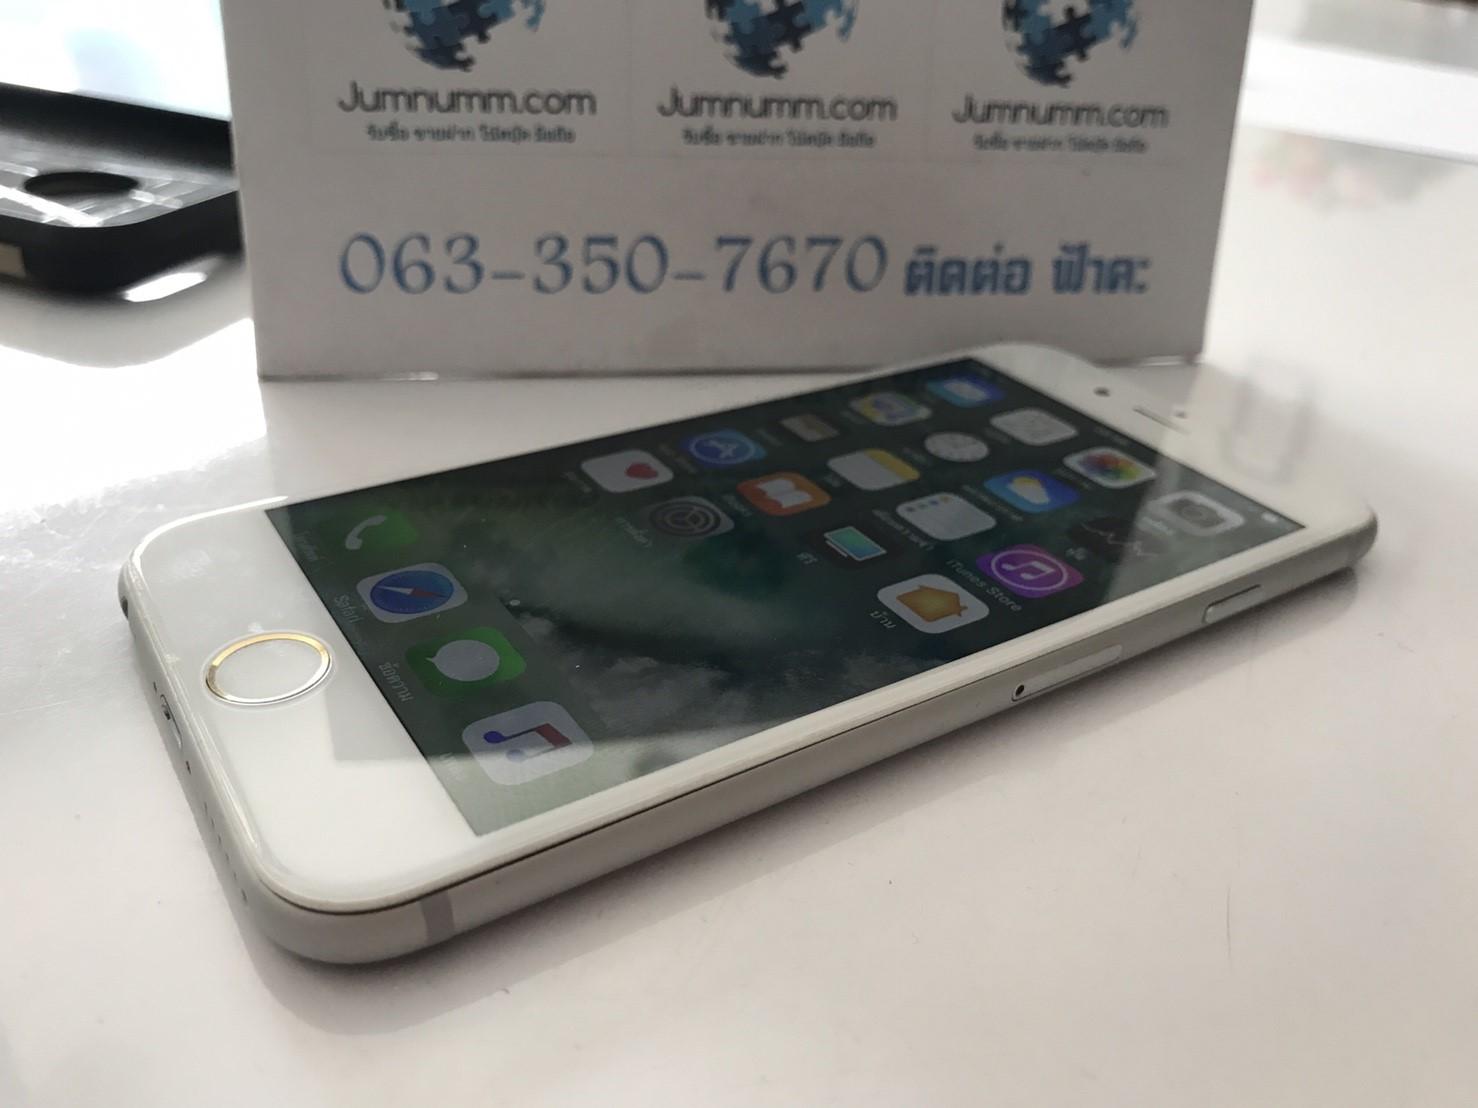 JMM-24 ขาย IPhone6 16GB สีเงิน ราคา 10,900 บาท